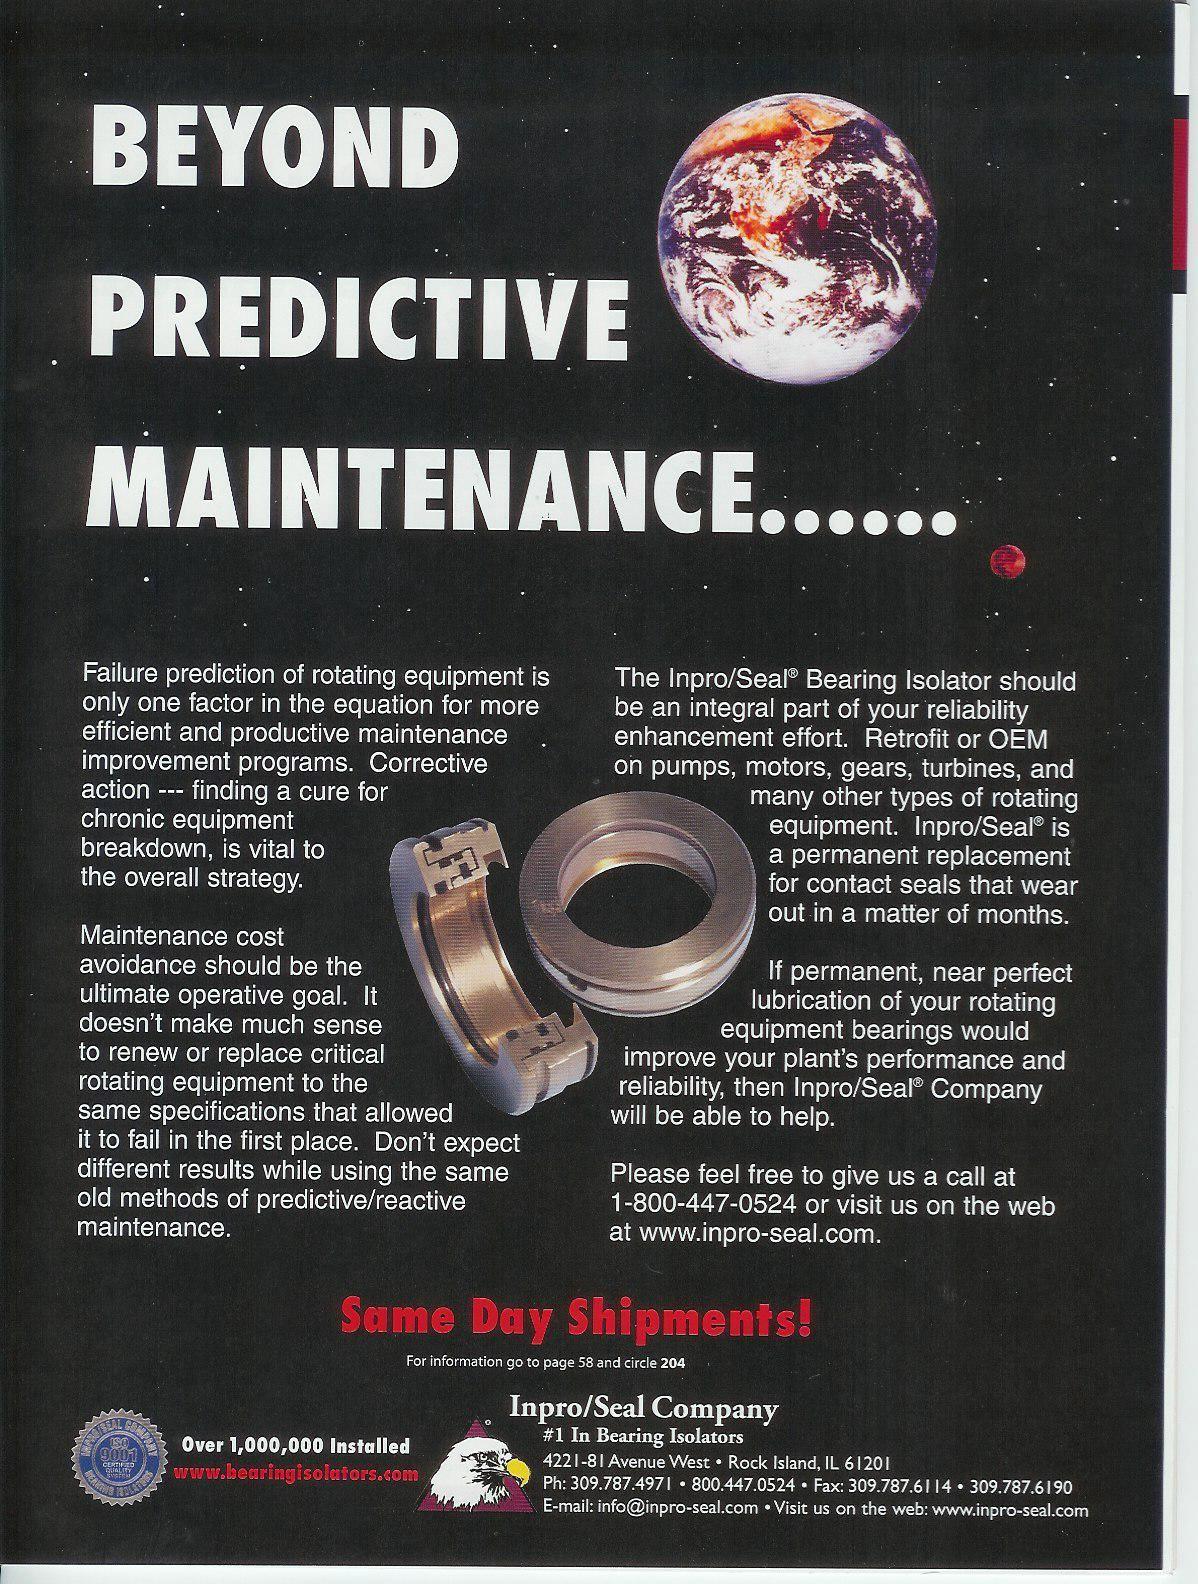 Beyond Predictive Maintenance